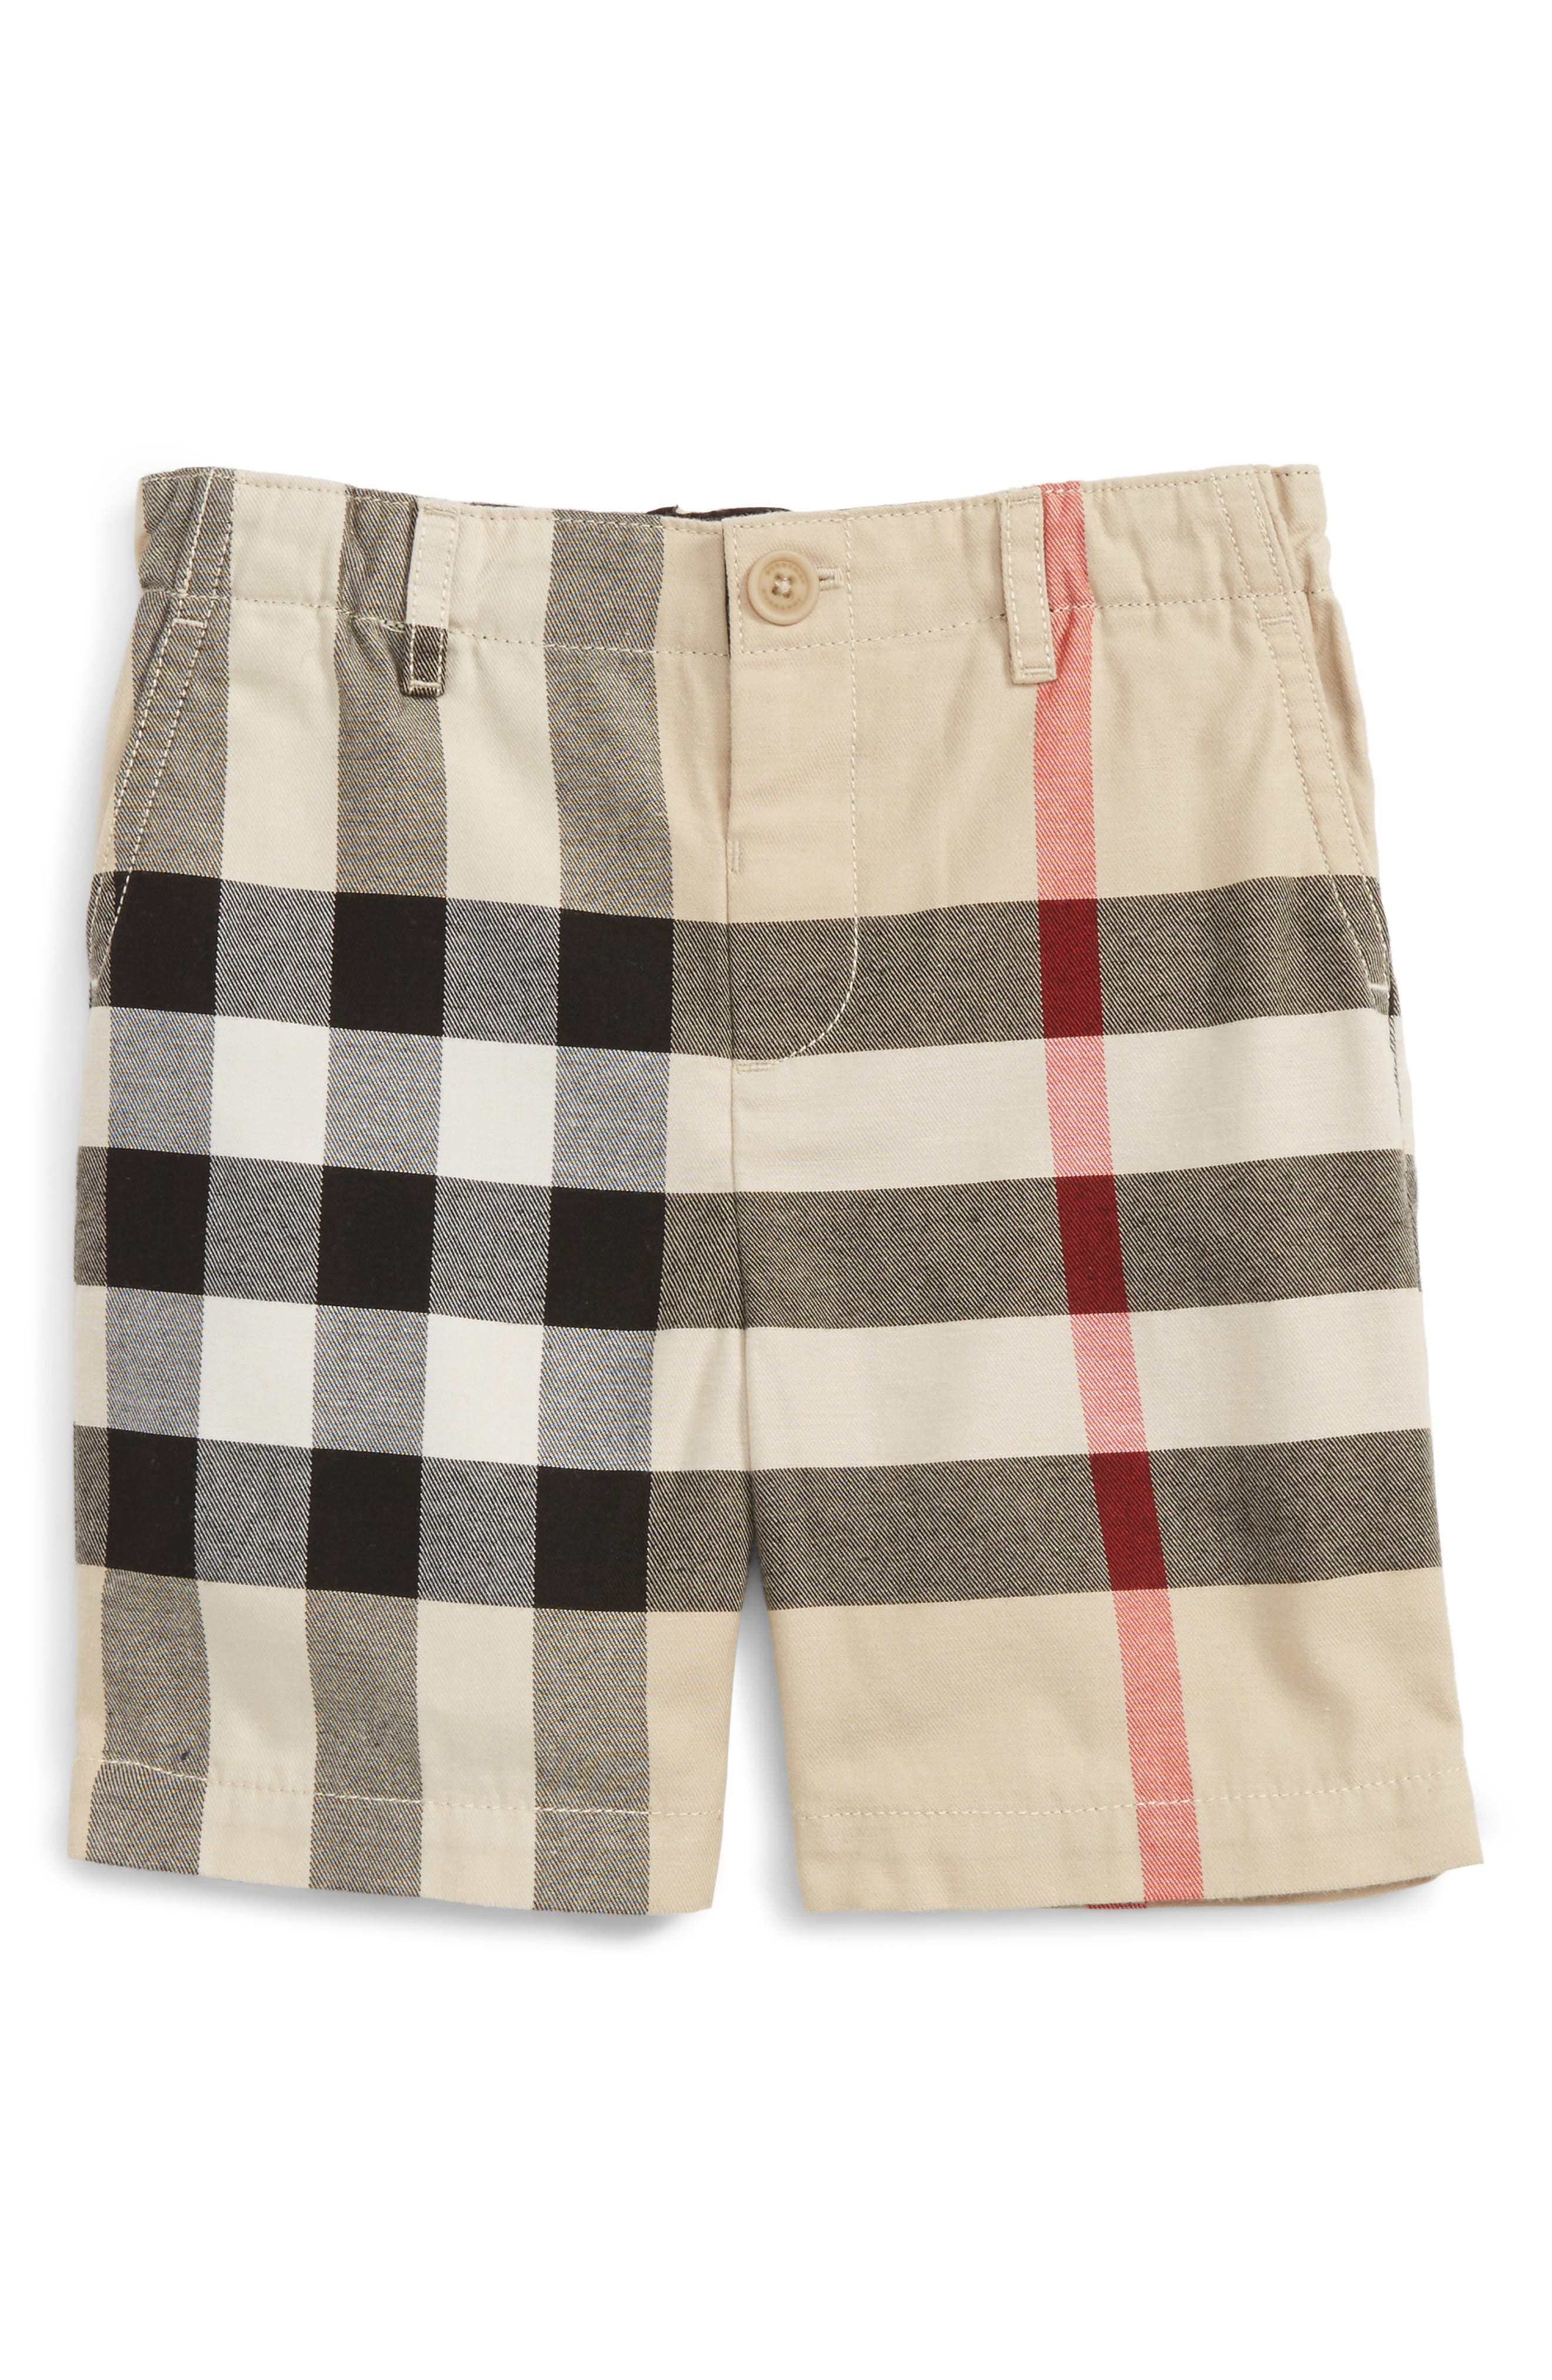 Sean Check Print Shorts,                         Main,                         color, Heritage Stone